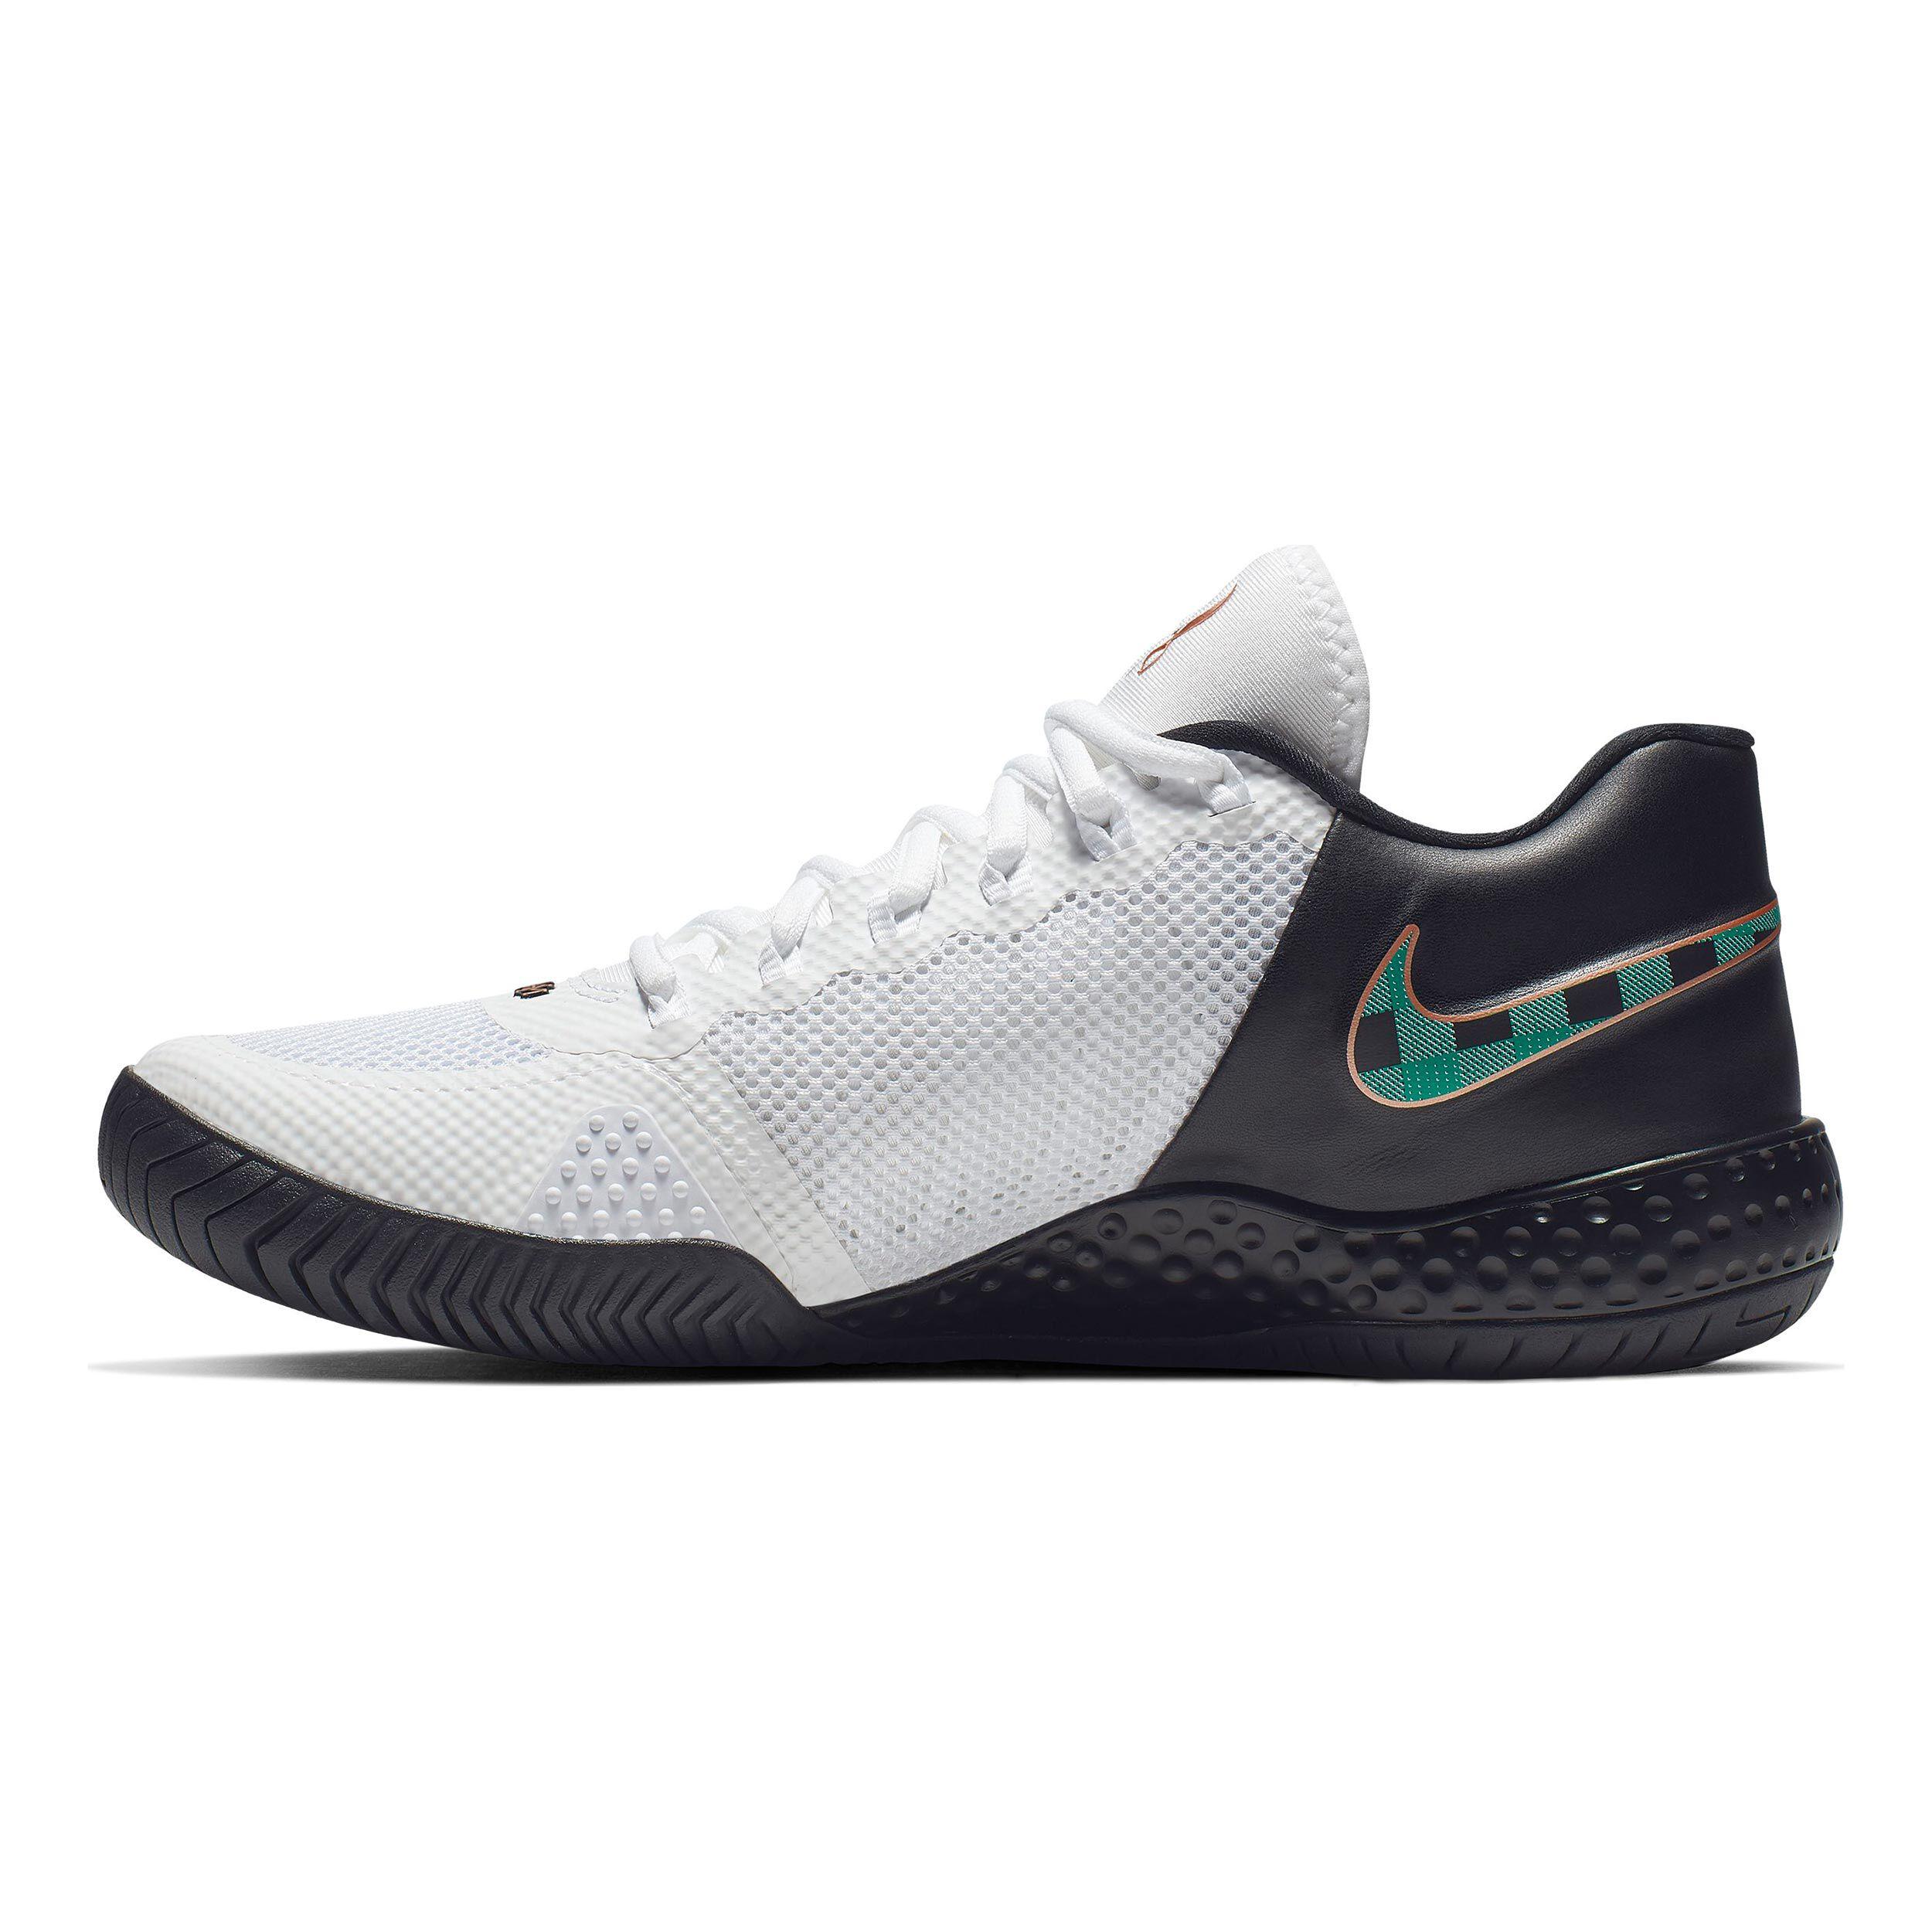 Nike Flare 2 HC Allcourt sko Damer Hvid, Sort køb online